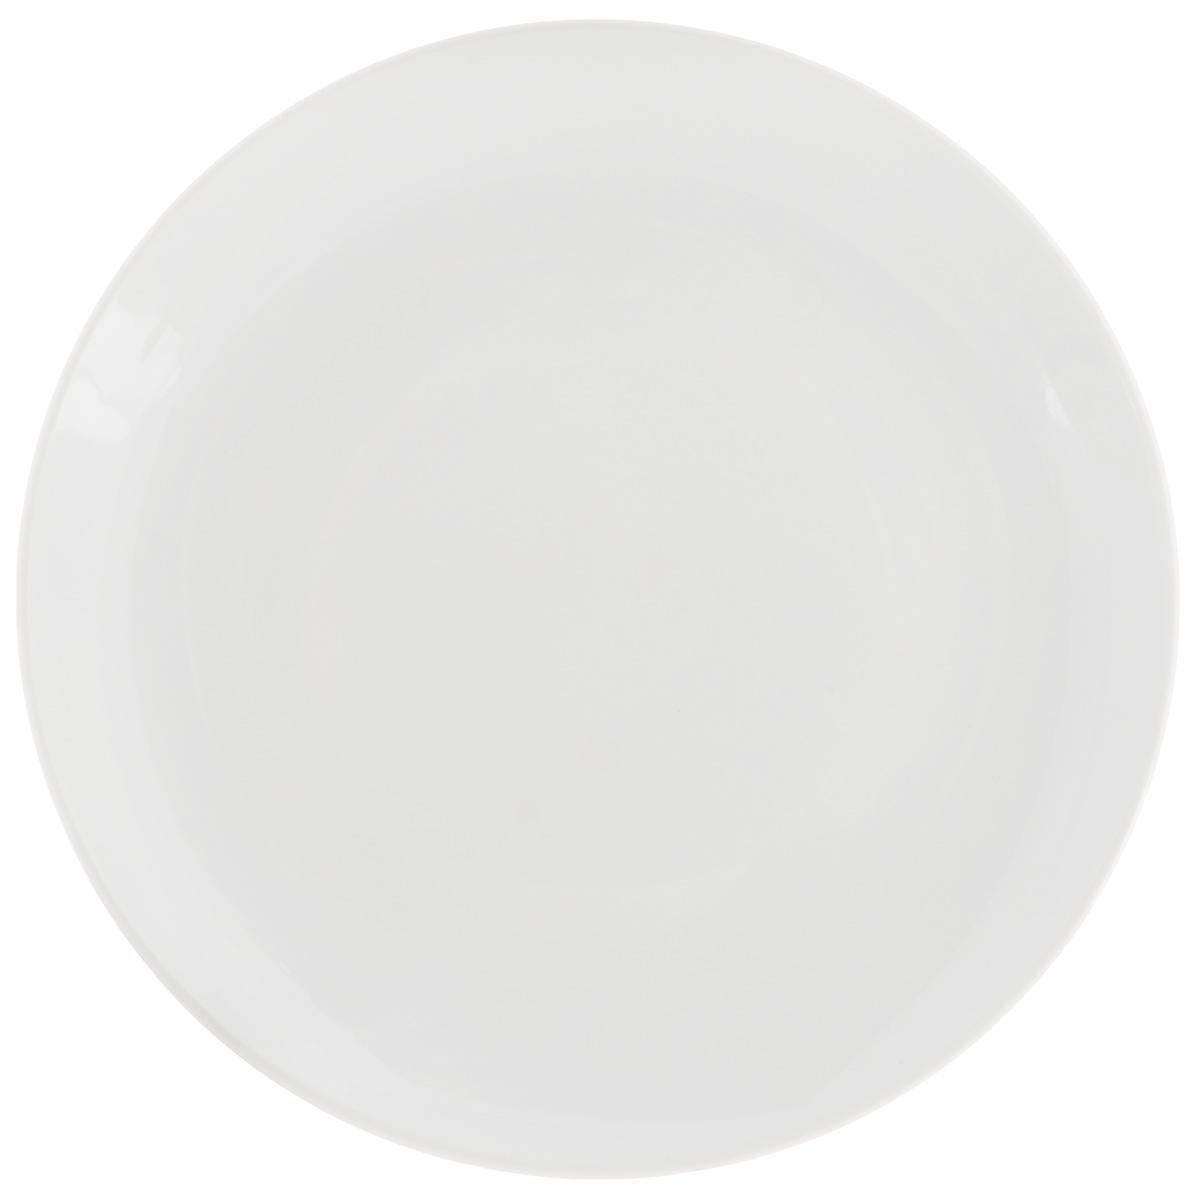 Тарелка десертная Фарфор Вербилок, диаметр 19 см тарелка dazen классика 23см десертная фарфор